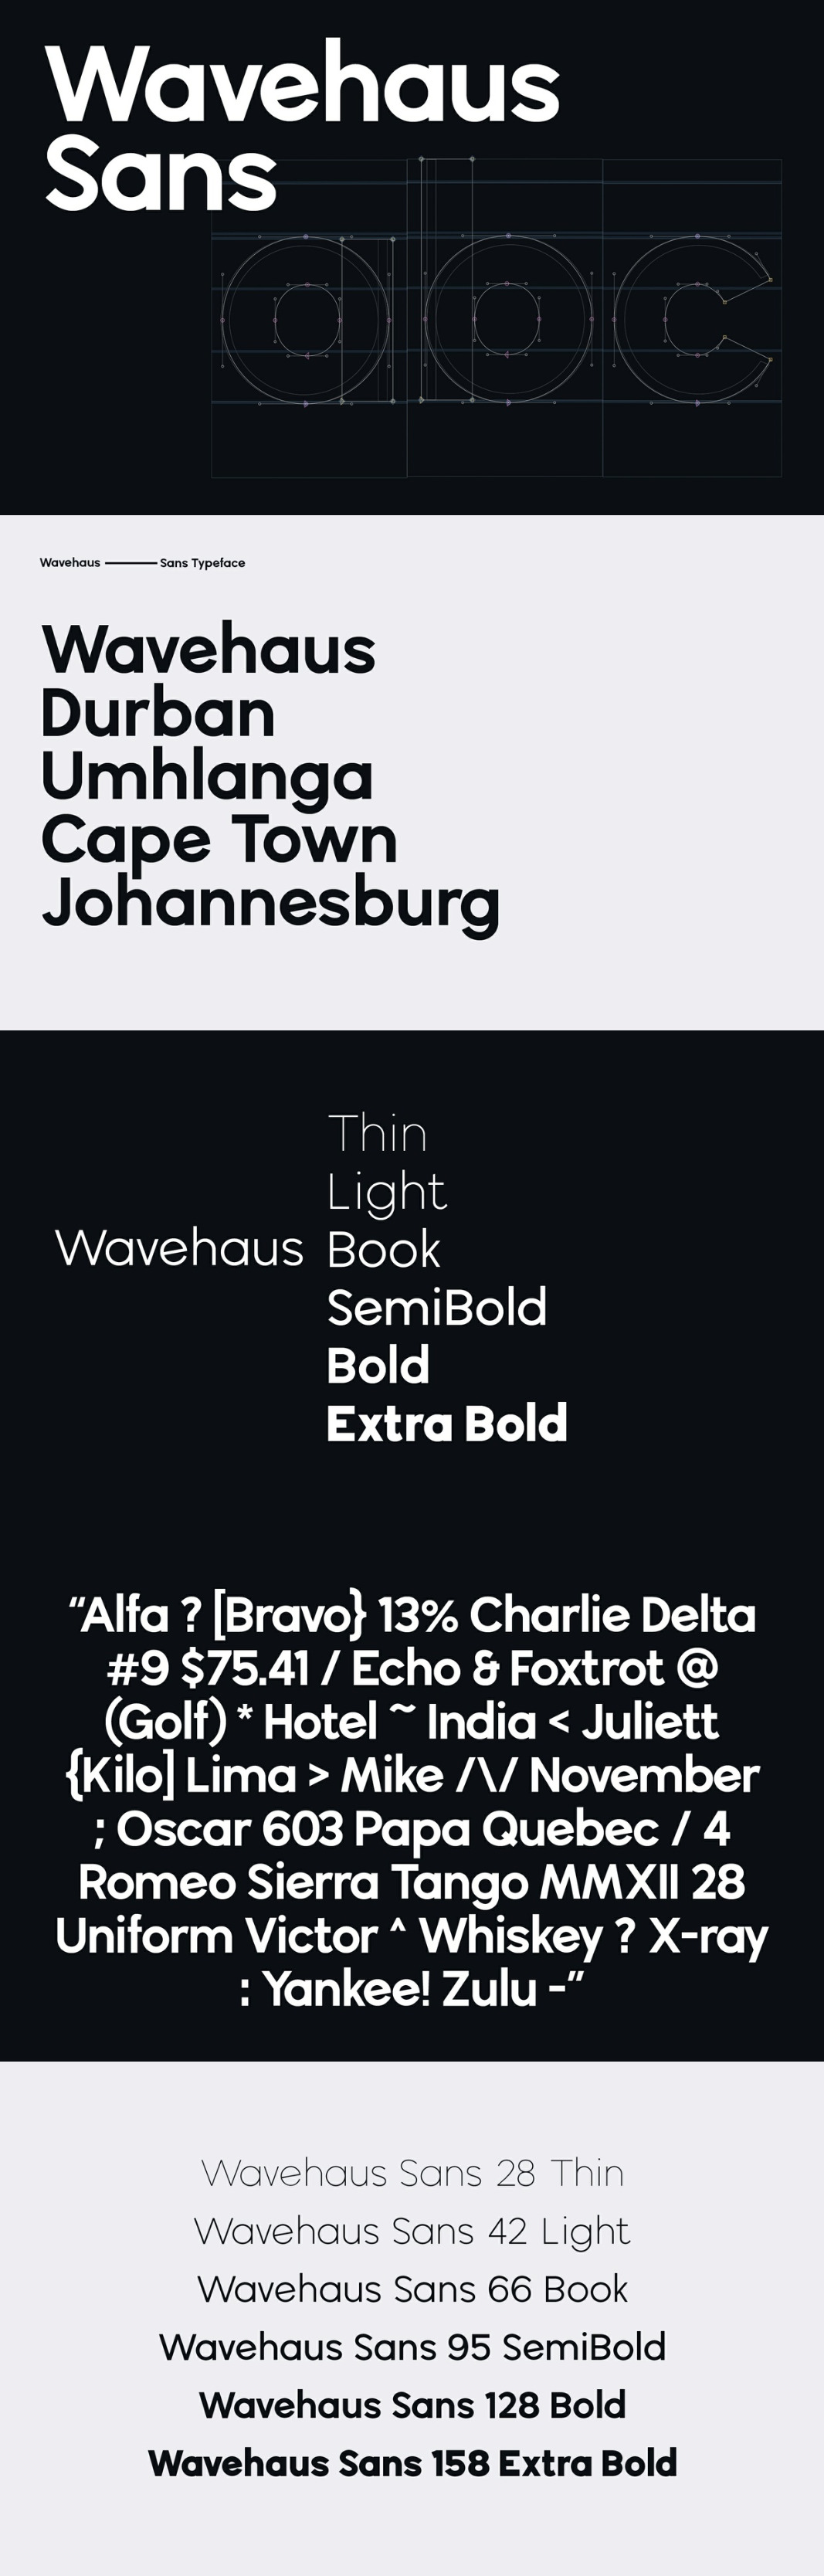 Wavehaus Sans Font Family - Free Fonts